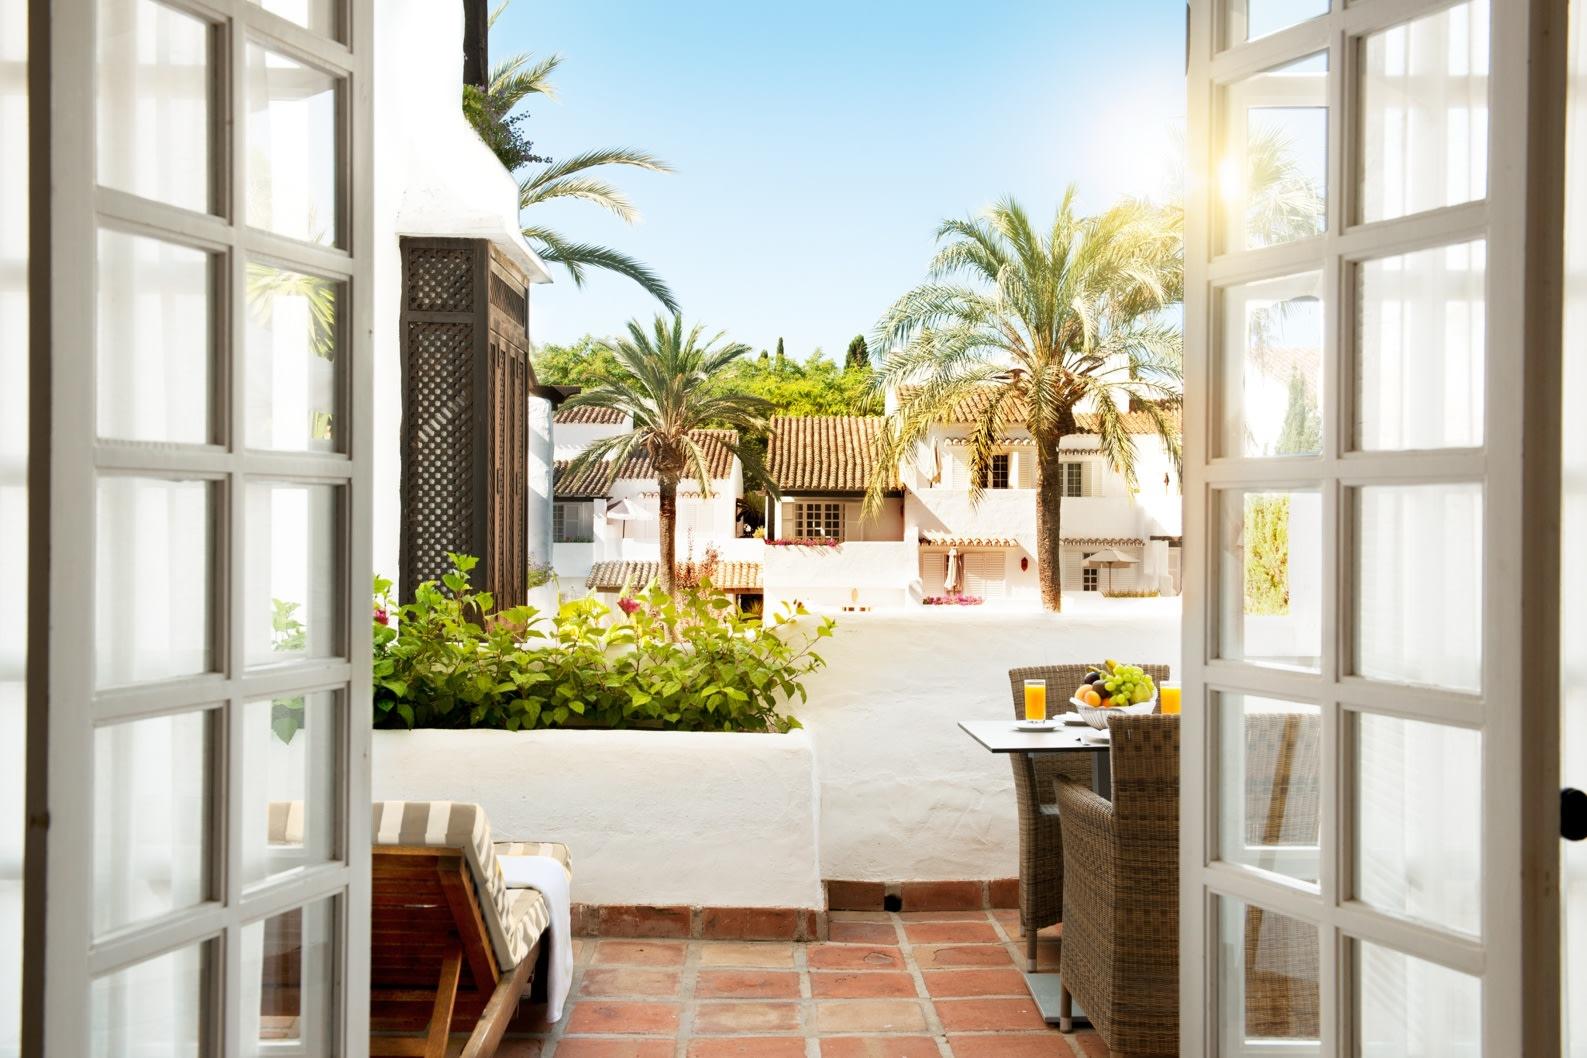 Balkon der Deluxe Garden Suite des Puente Romano Hotels